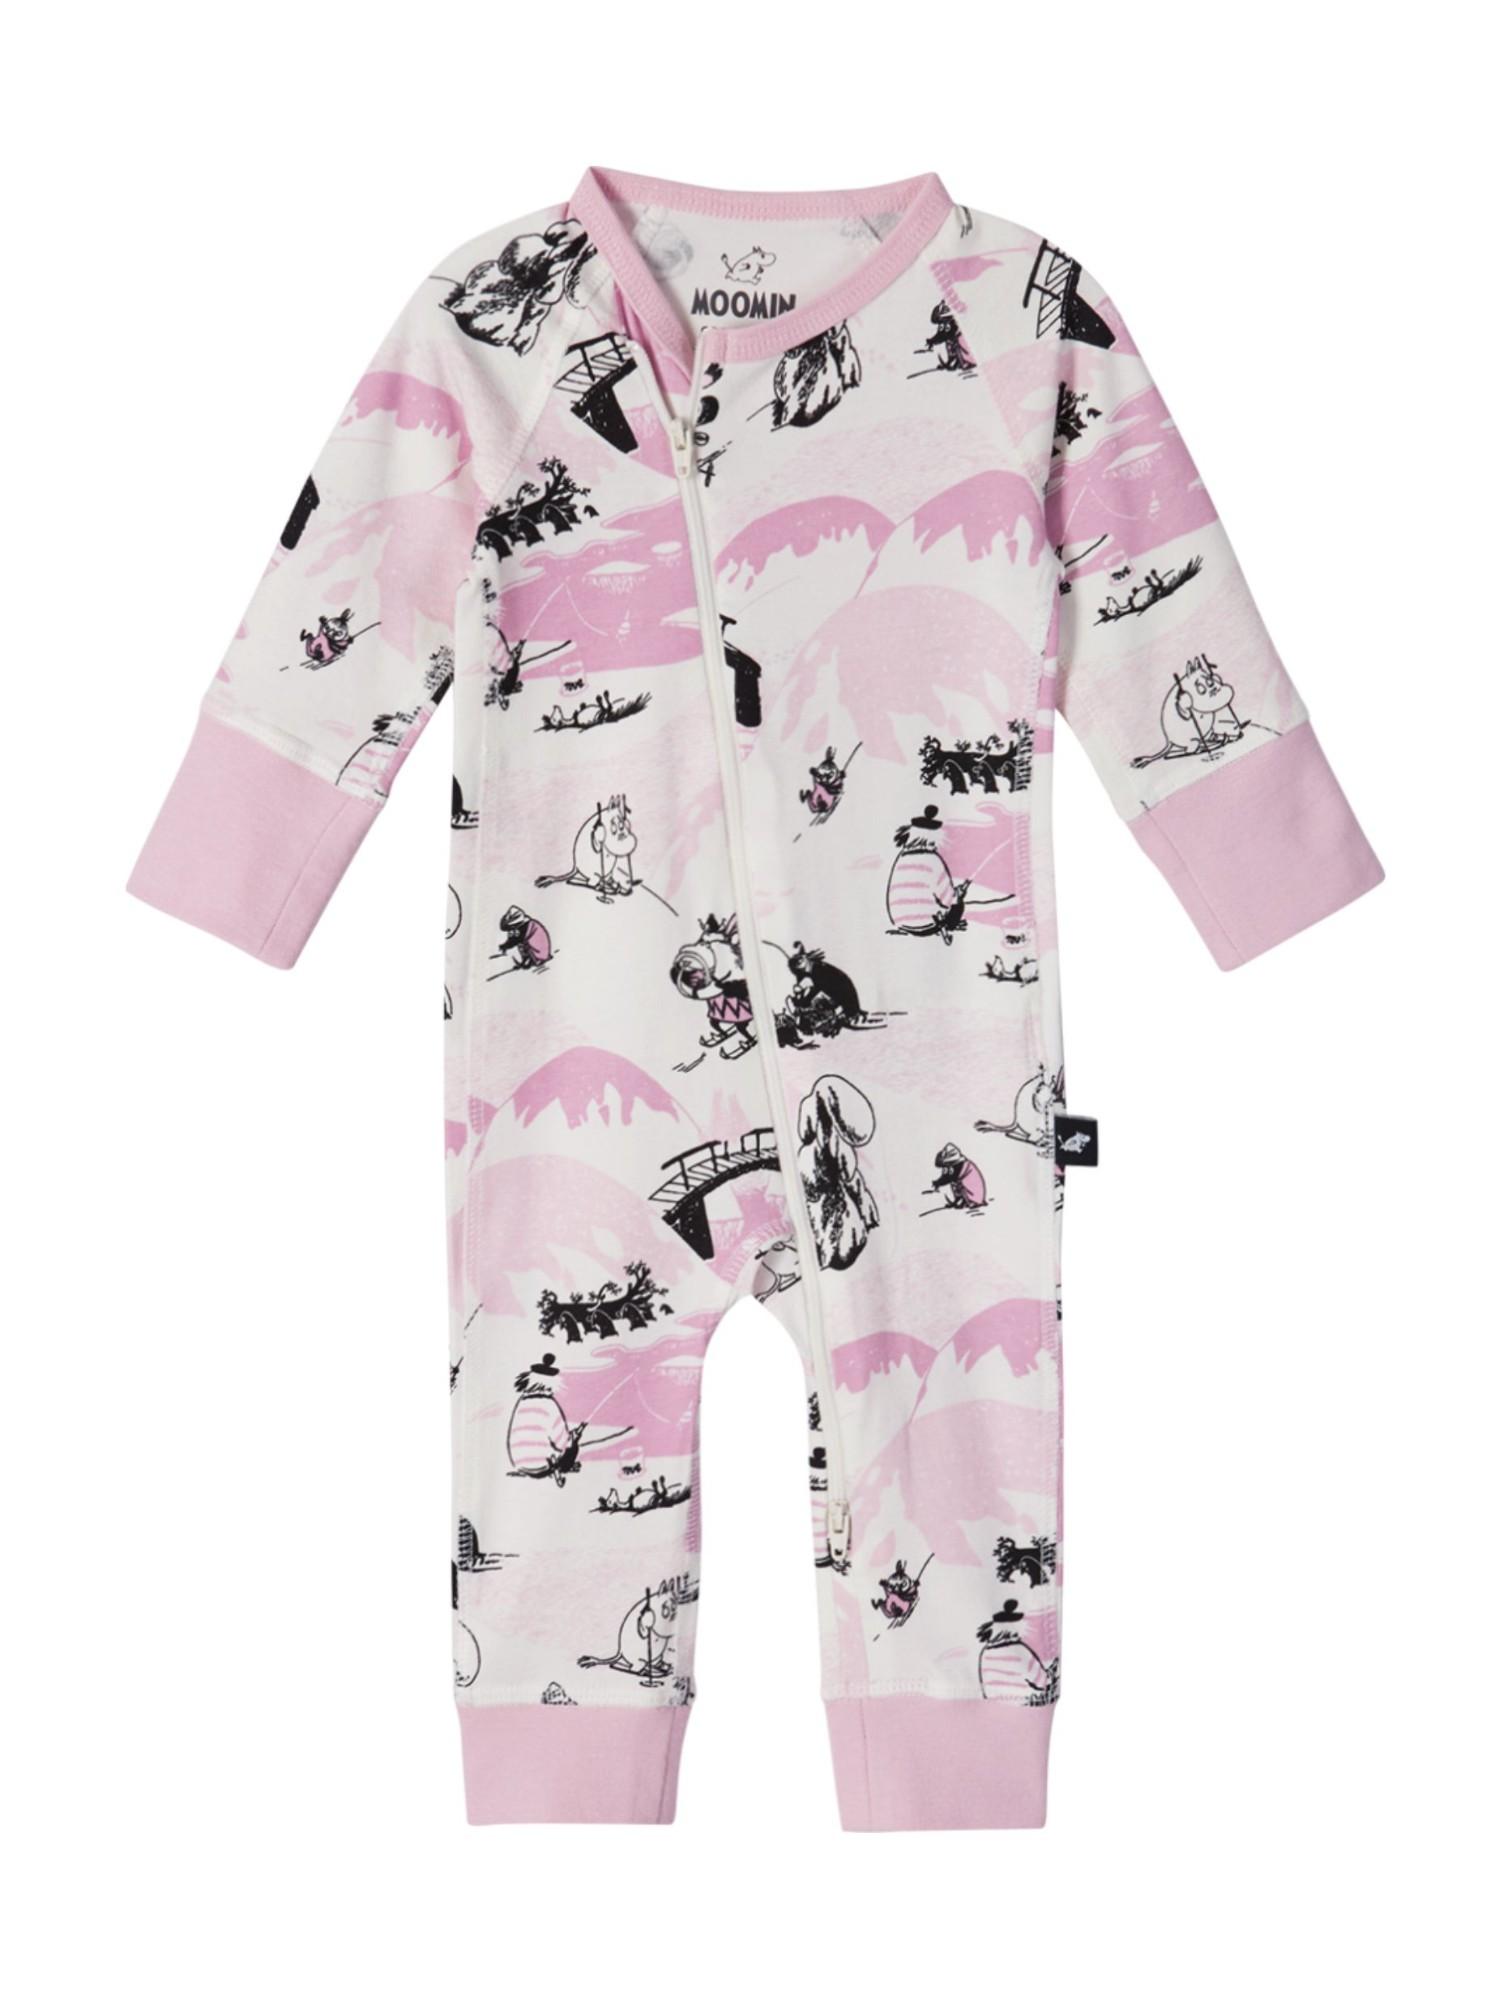 REIMA Moomin Trygg Blush Pink 62-68